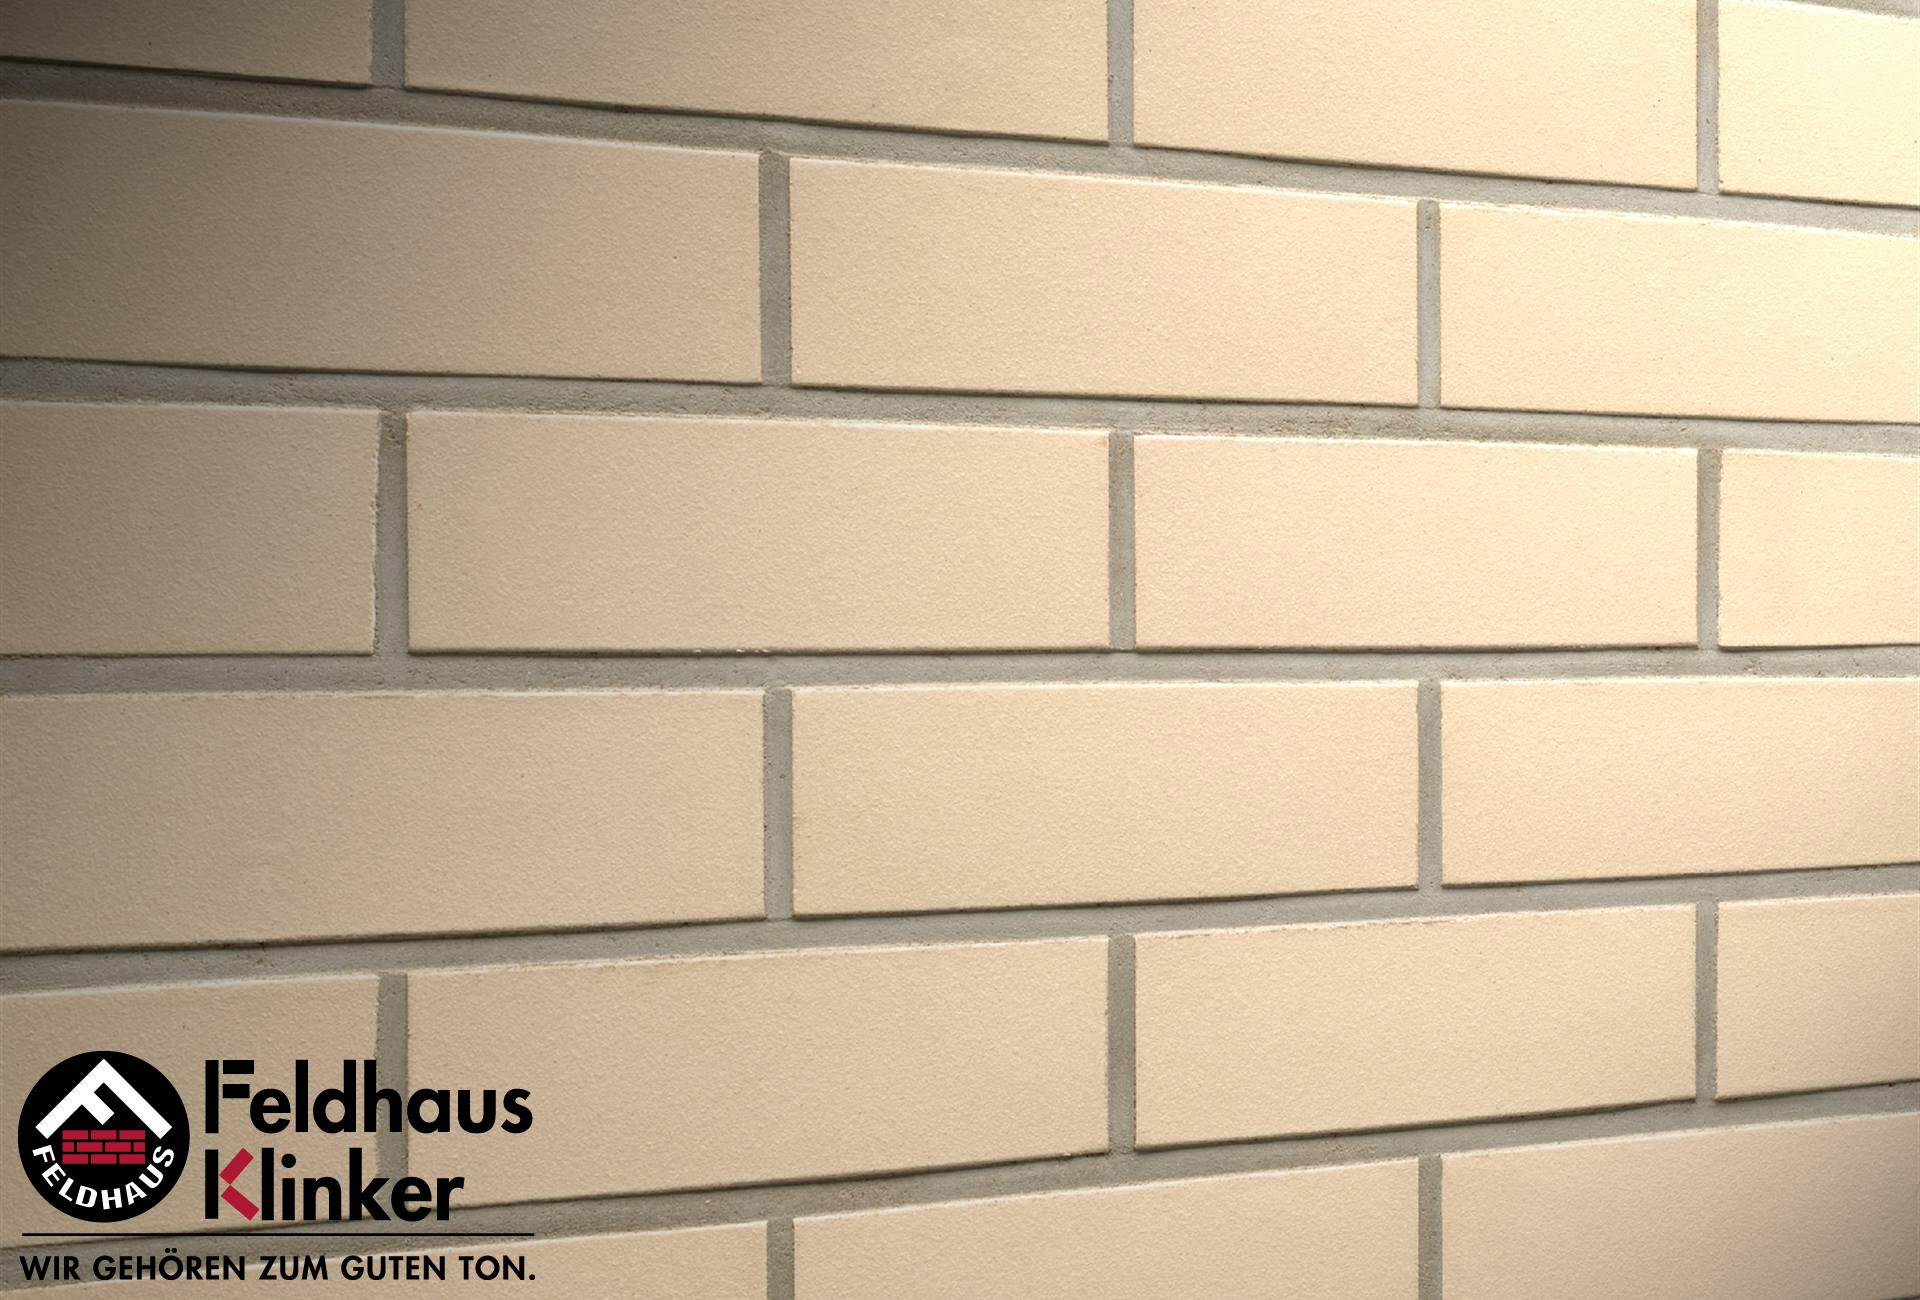 R100 Feldhaus Klinker клинкерная плитка 1